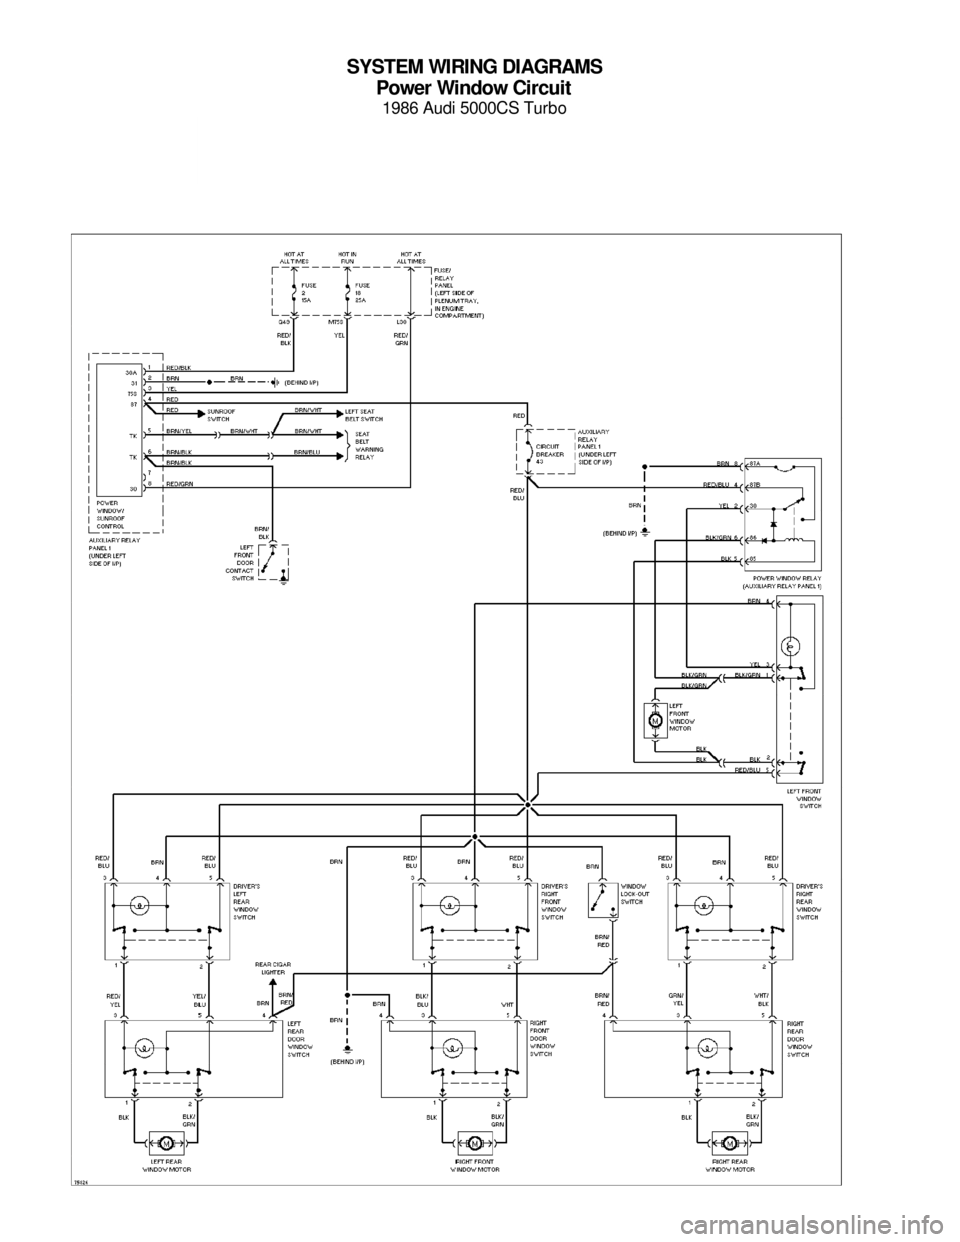 Audi 5000cs 1986 c2 system wiring diagram page 17 system wiring diagrams power window circuit